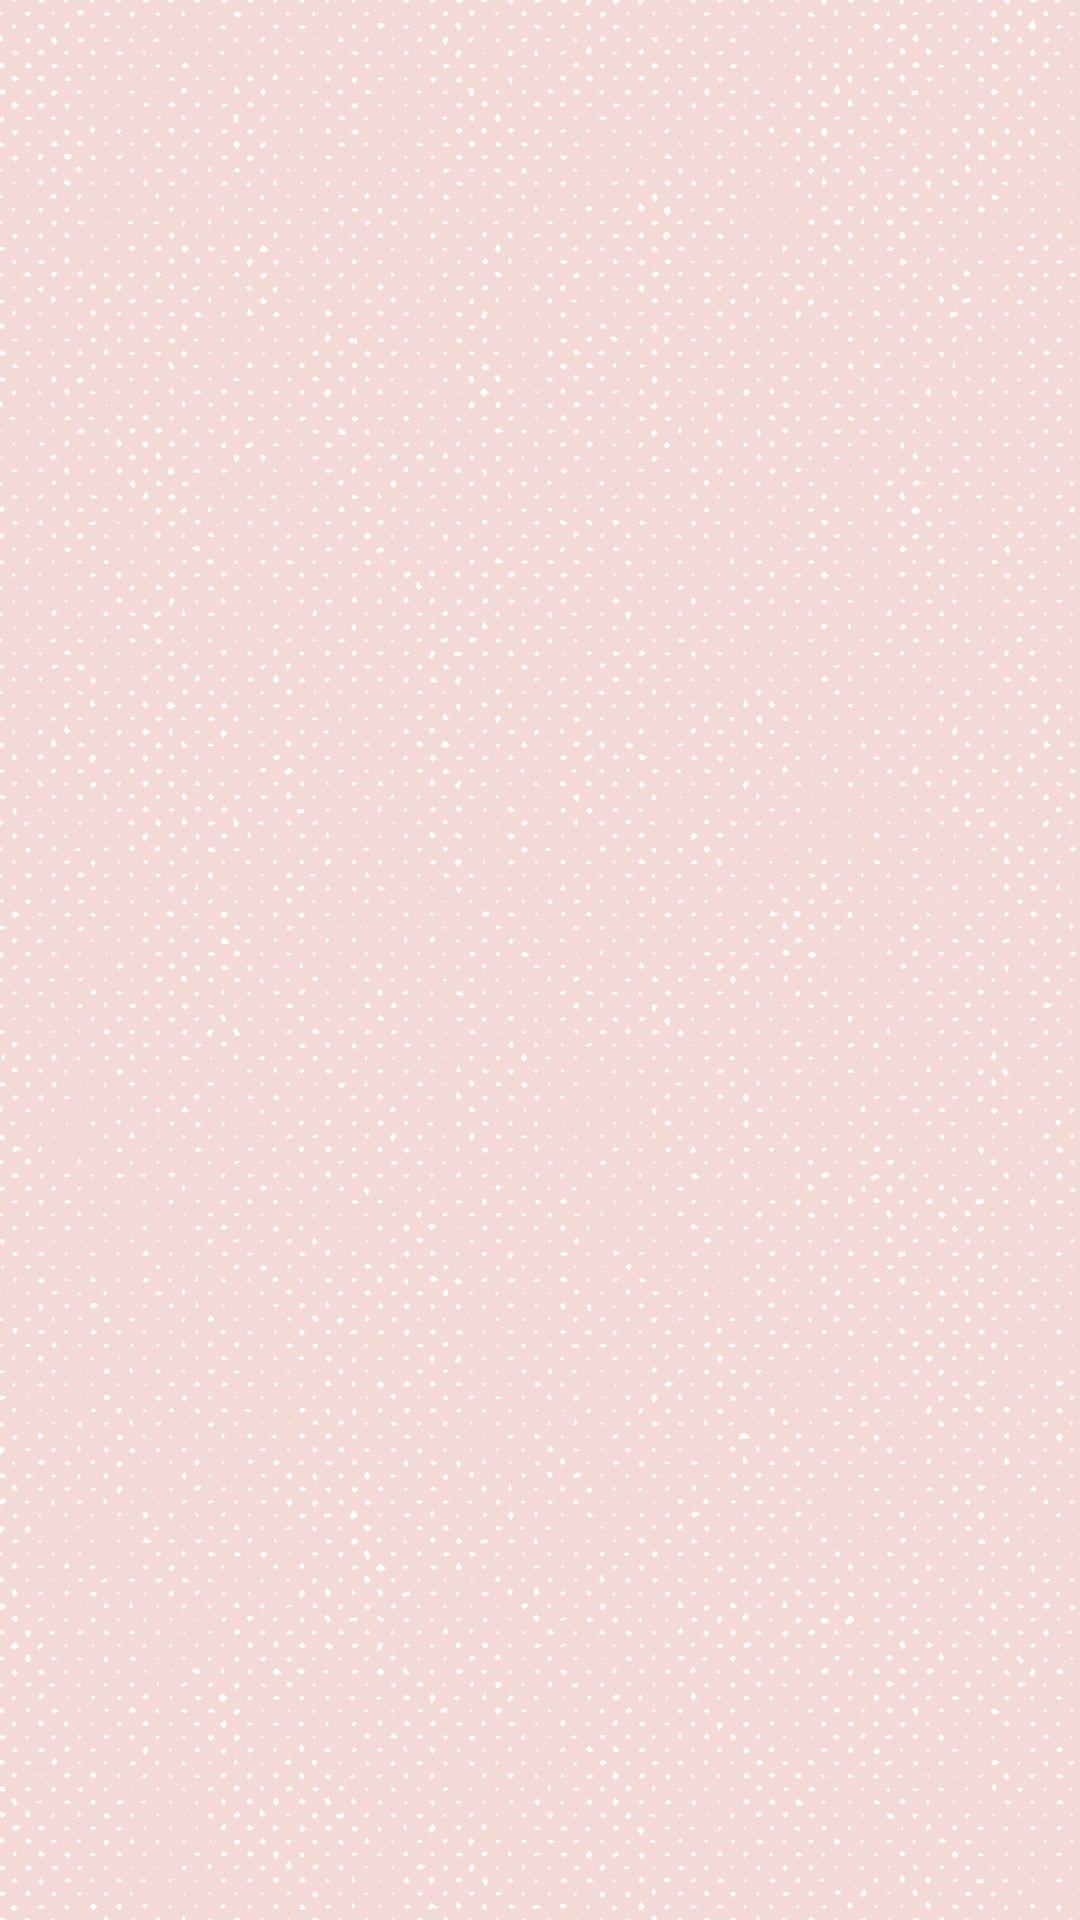 Wonderful Wallpaper Home Screen Cute - f5230635881415b328302c6acd644954  Photograph_443130.jpg